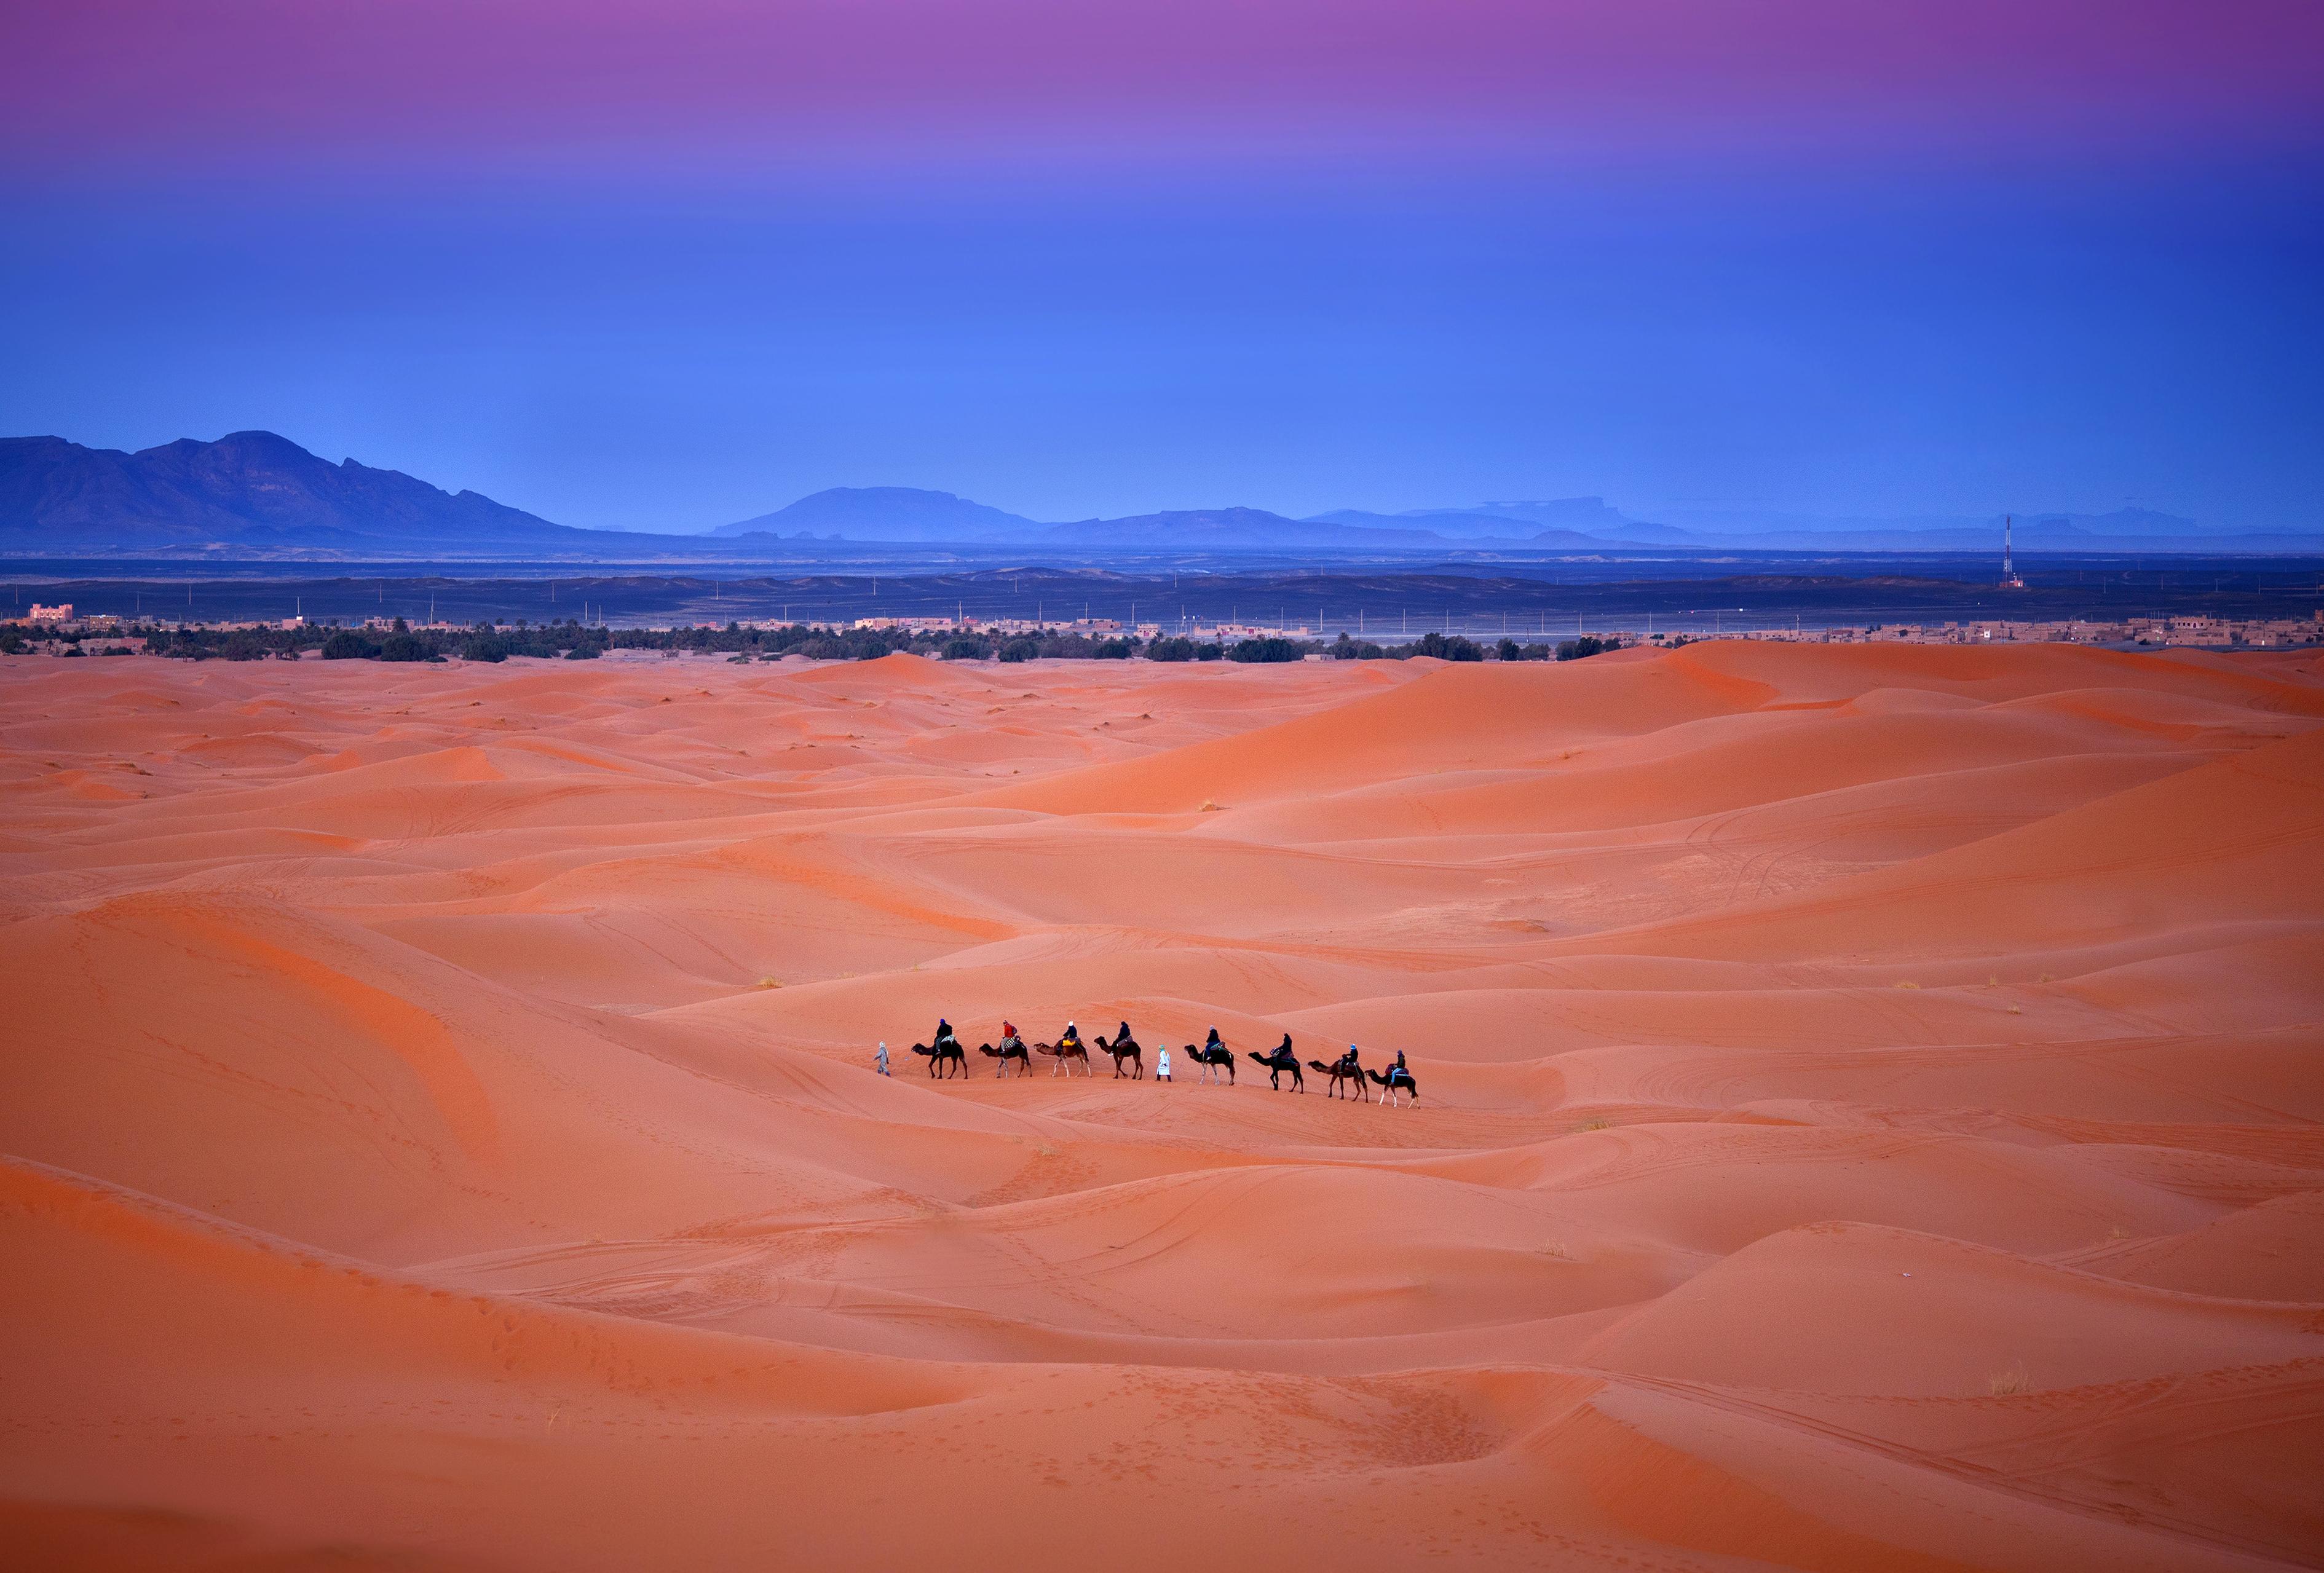 bigstock-Camel-Trekking-In-Western-Saha-149809940